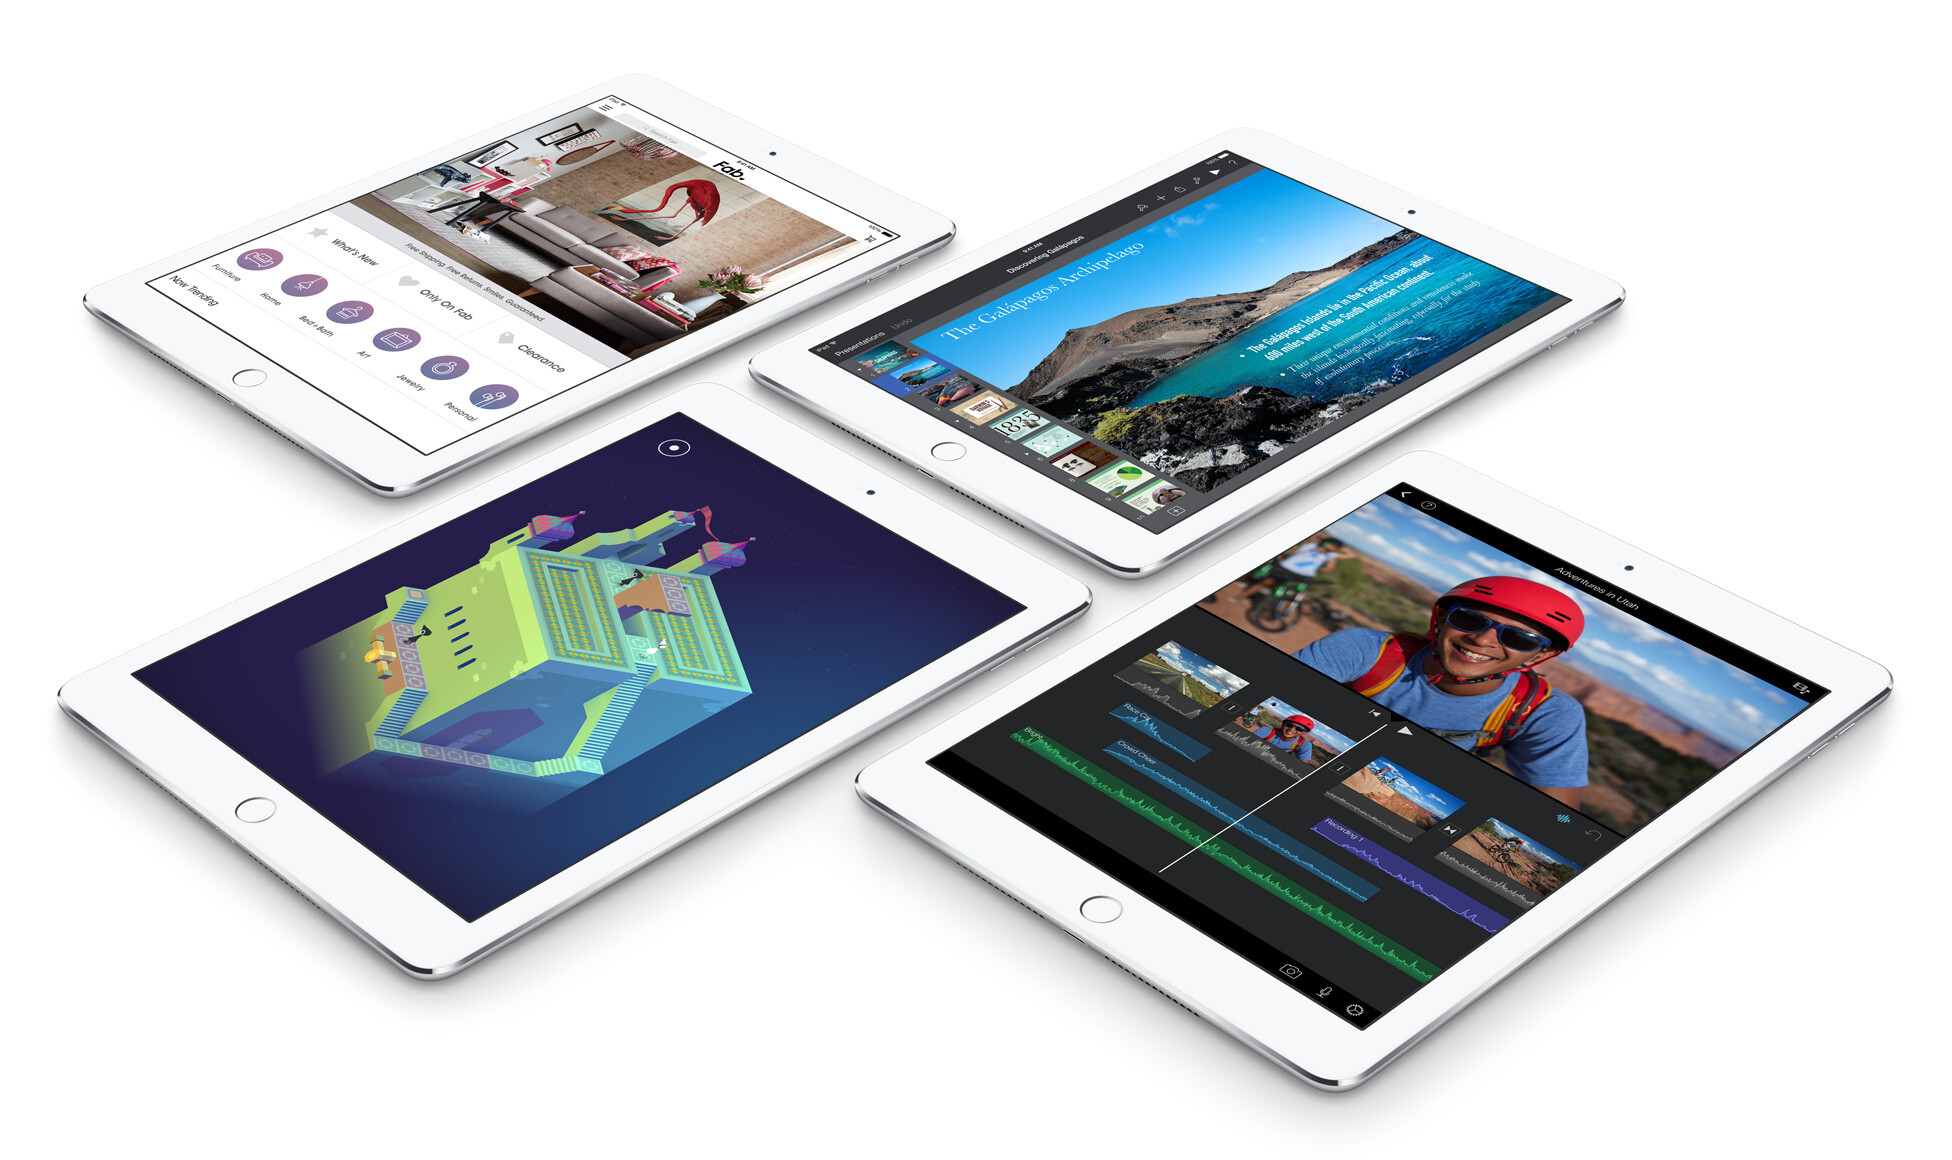 apple ipad air 2 user manual pdf